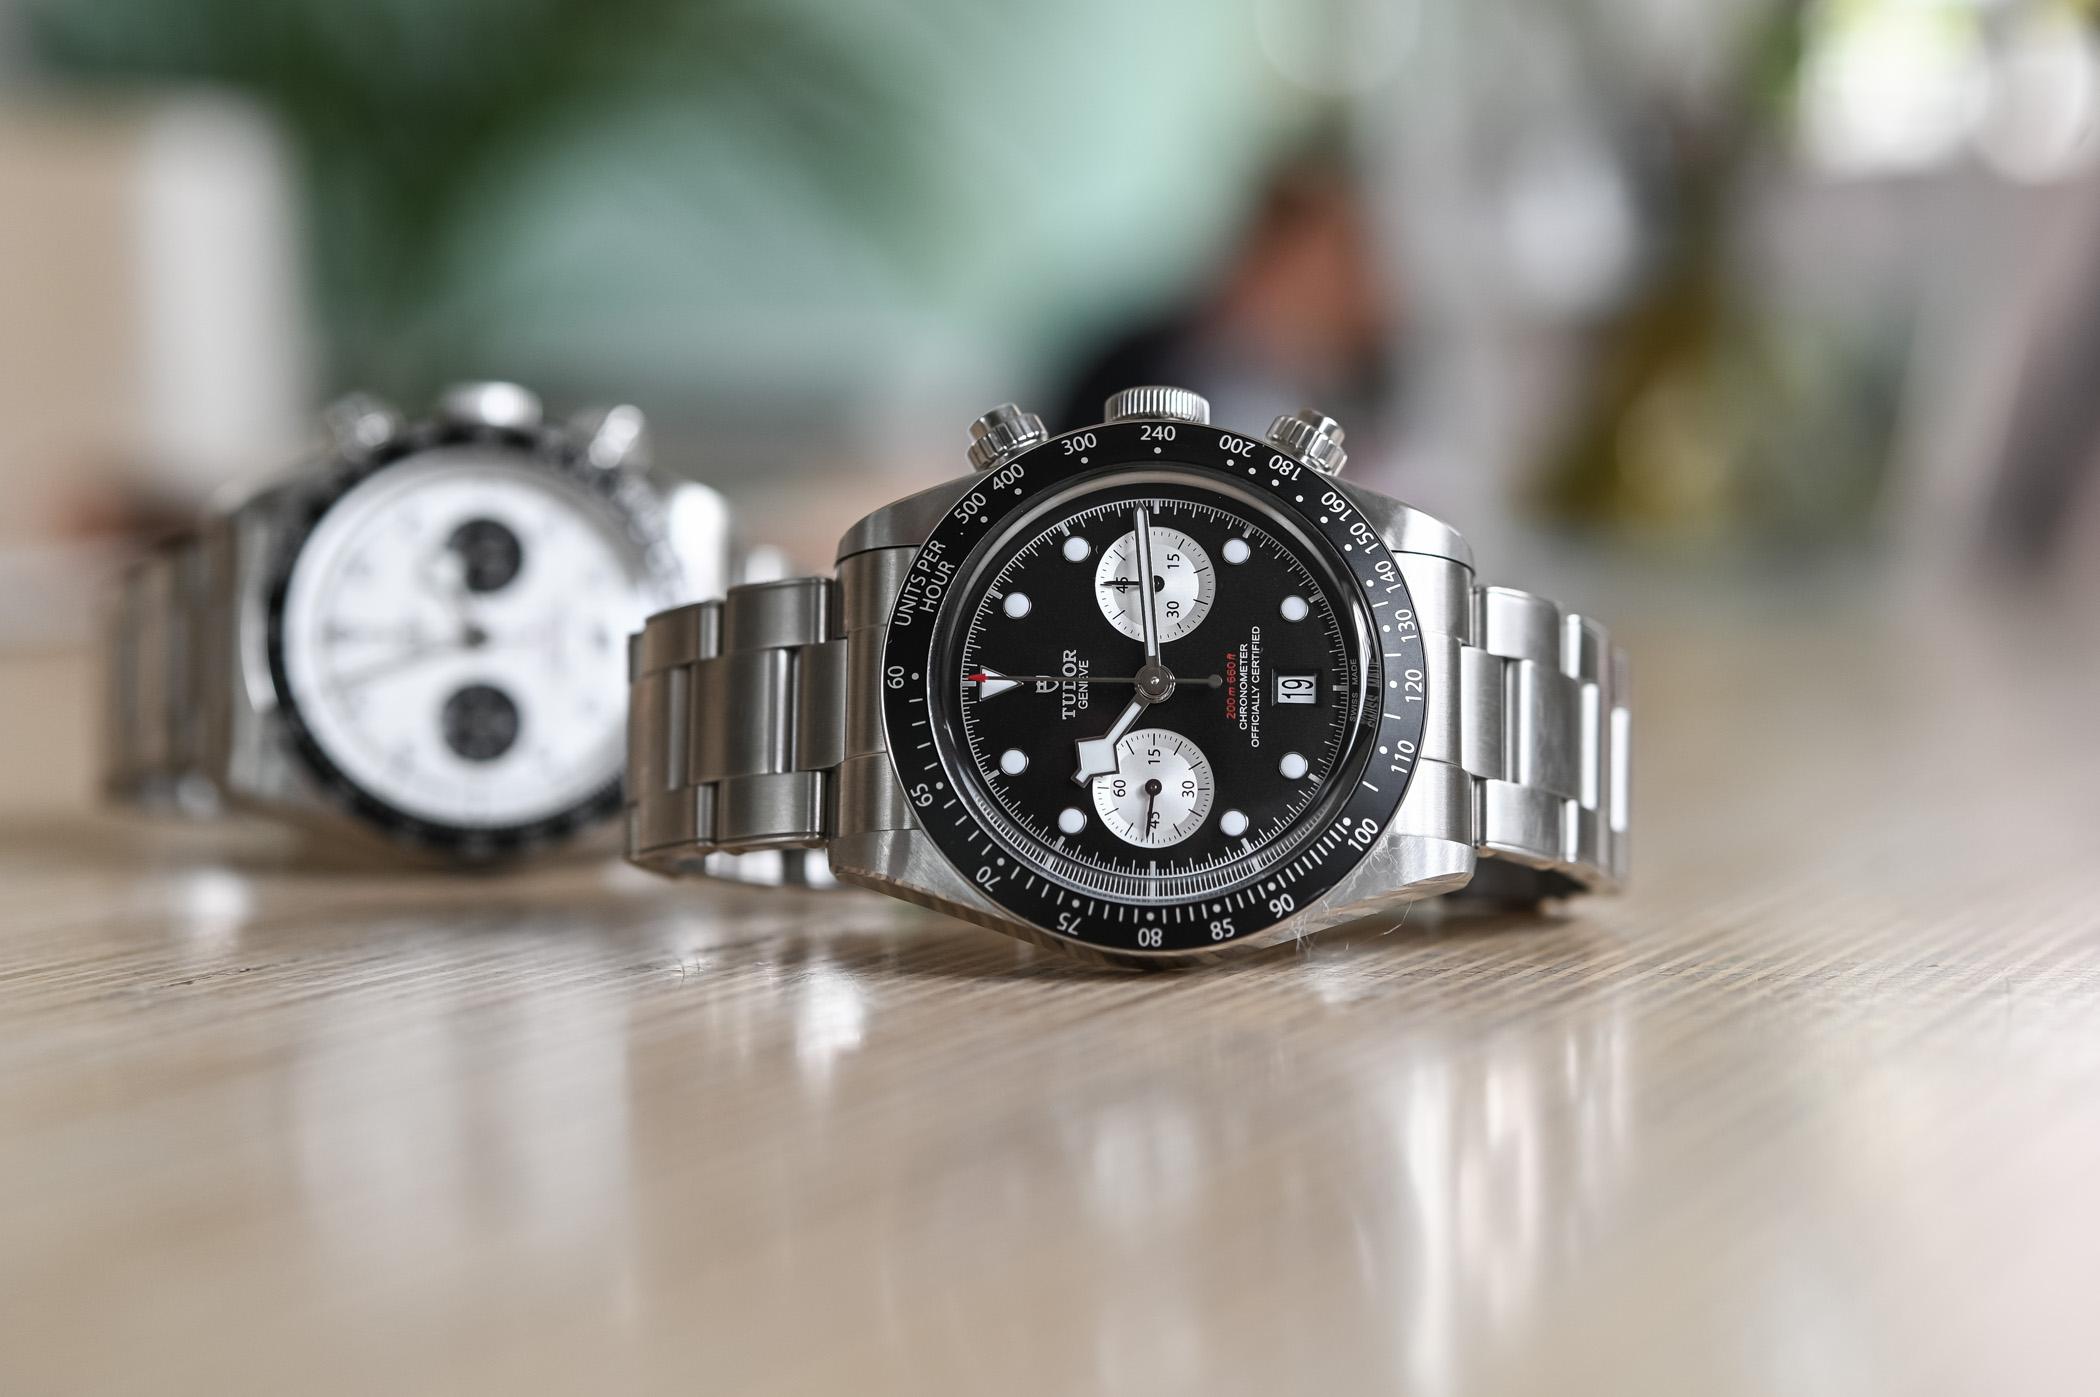 2021 Tudor Black Bay Chrono Reversed Panda Black Bezel 79360N - review - 5